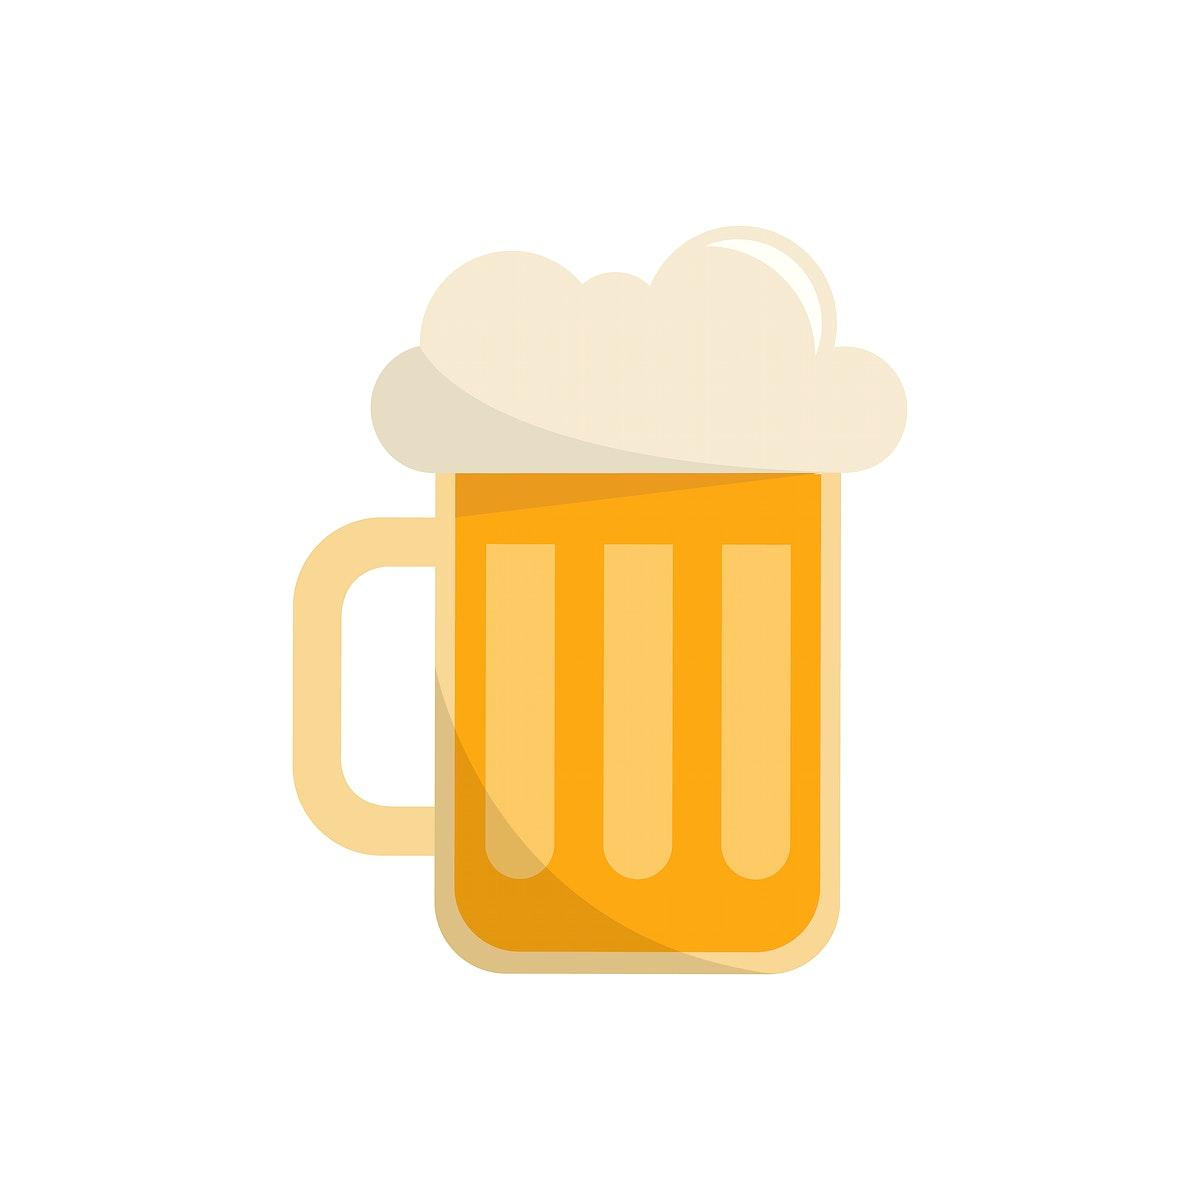 Beer mug isolated graphic illustration